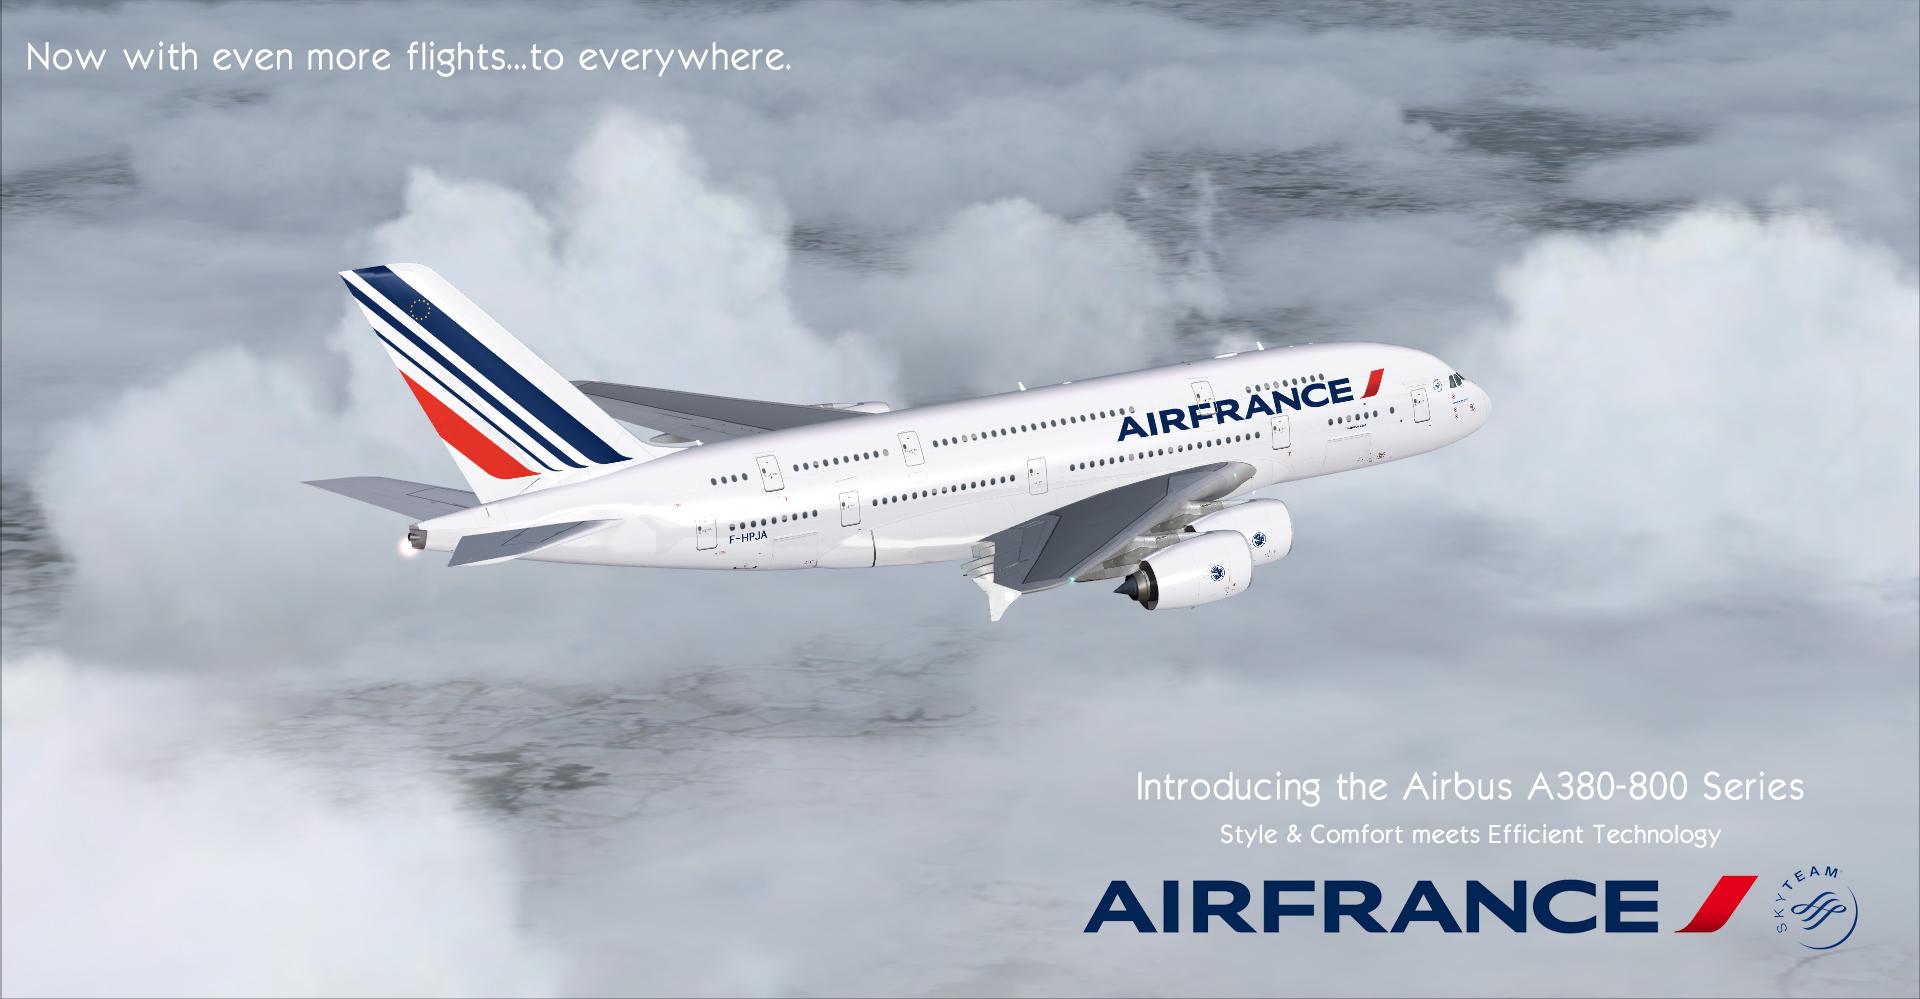 air france concorde wallpaper - photo #19